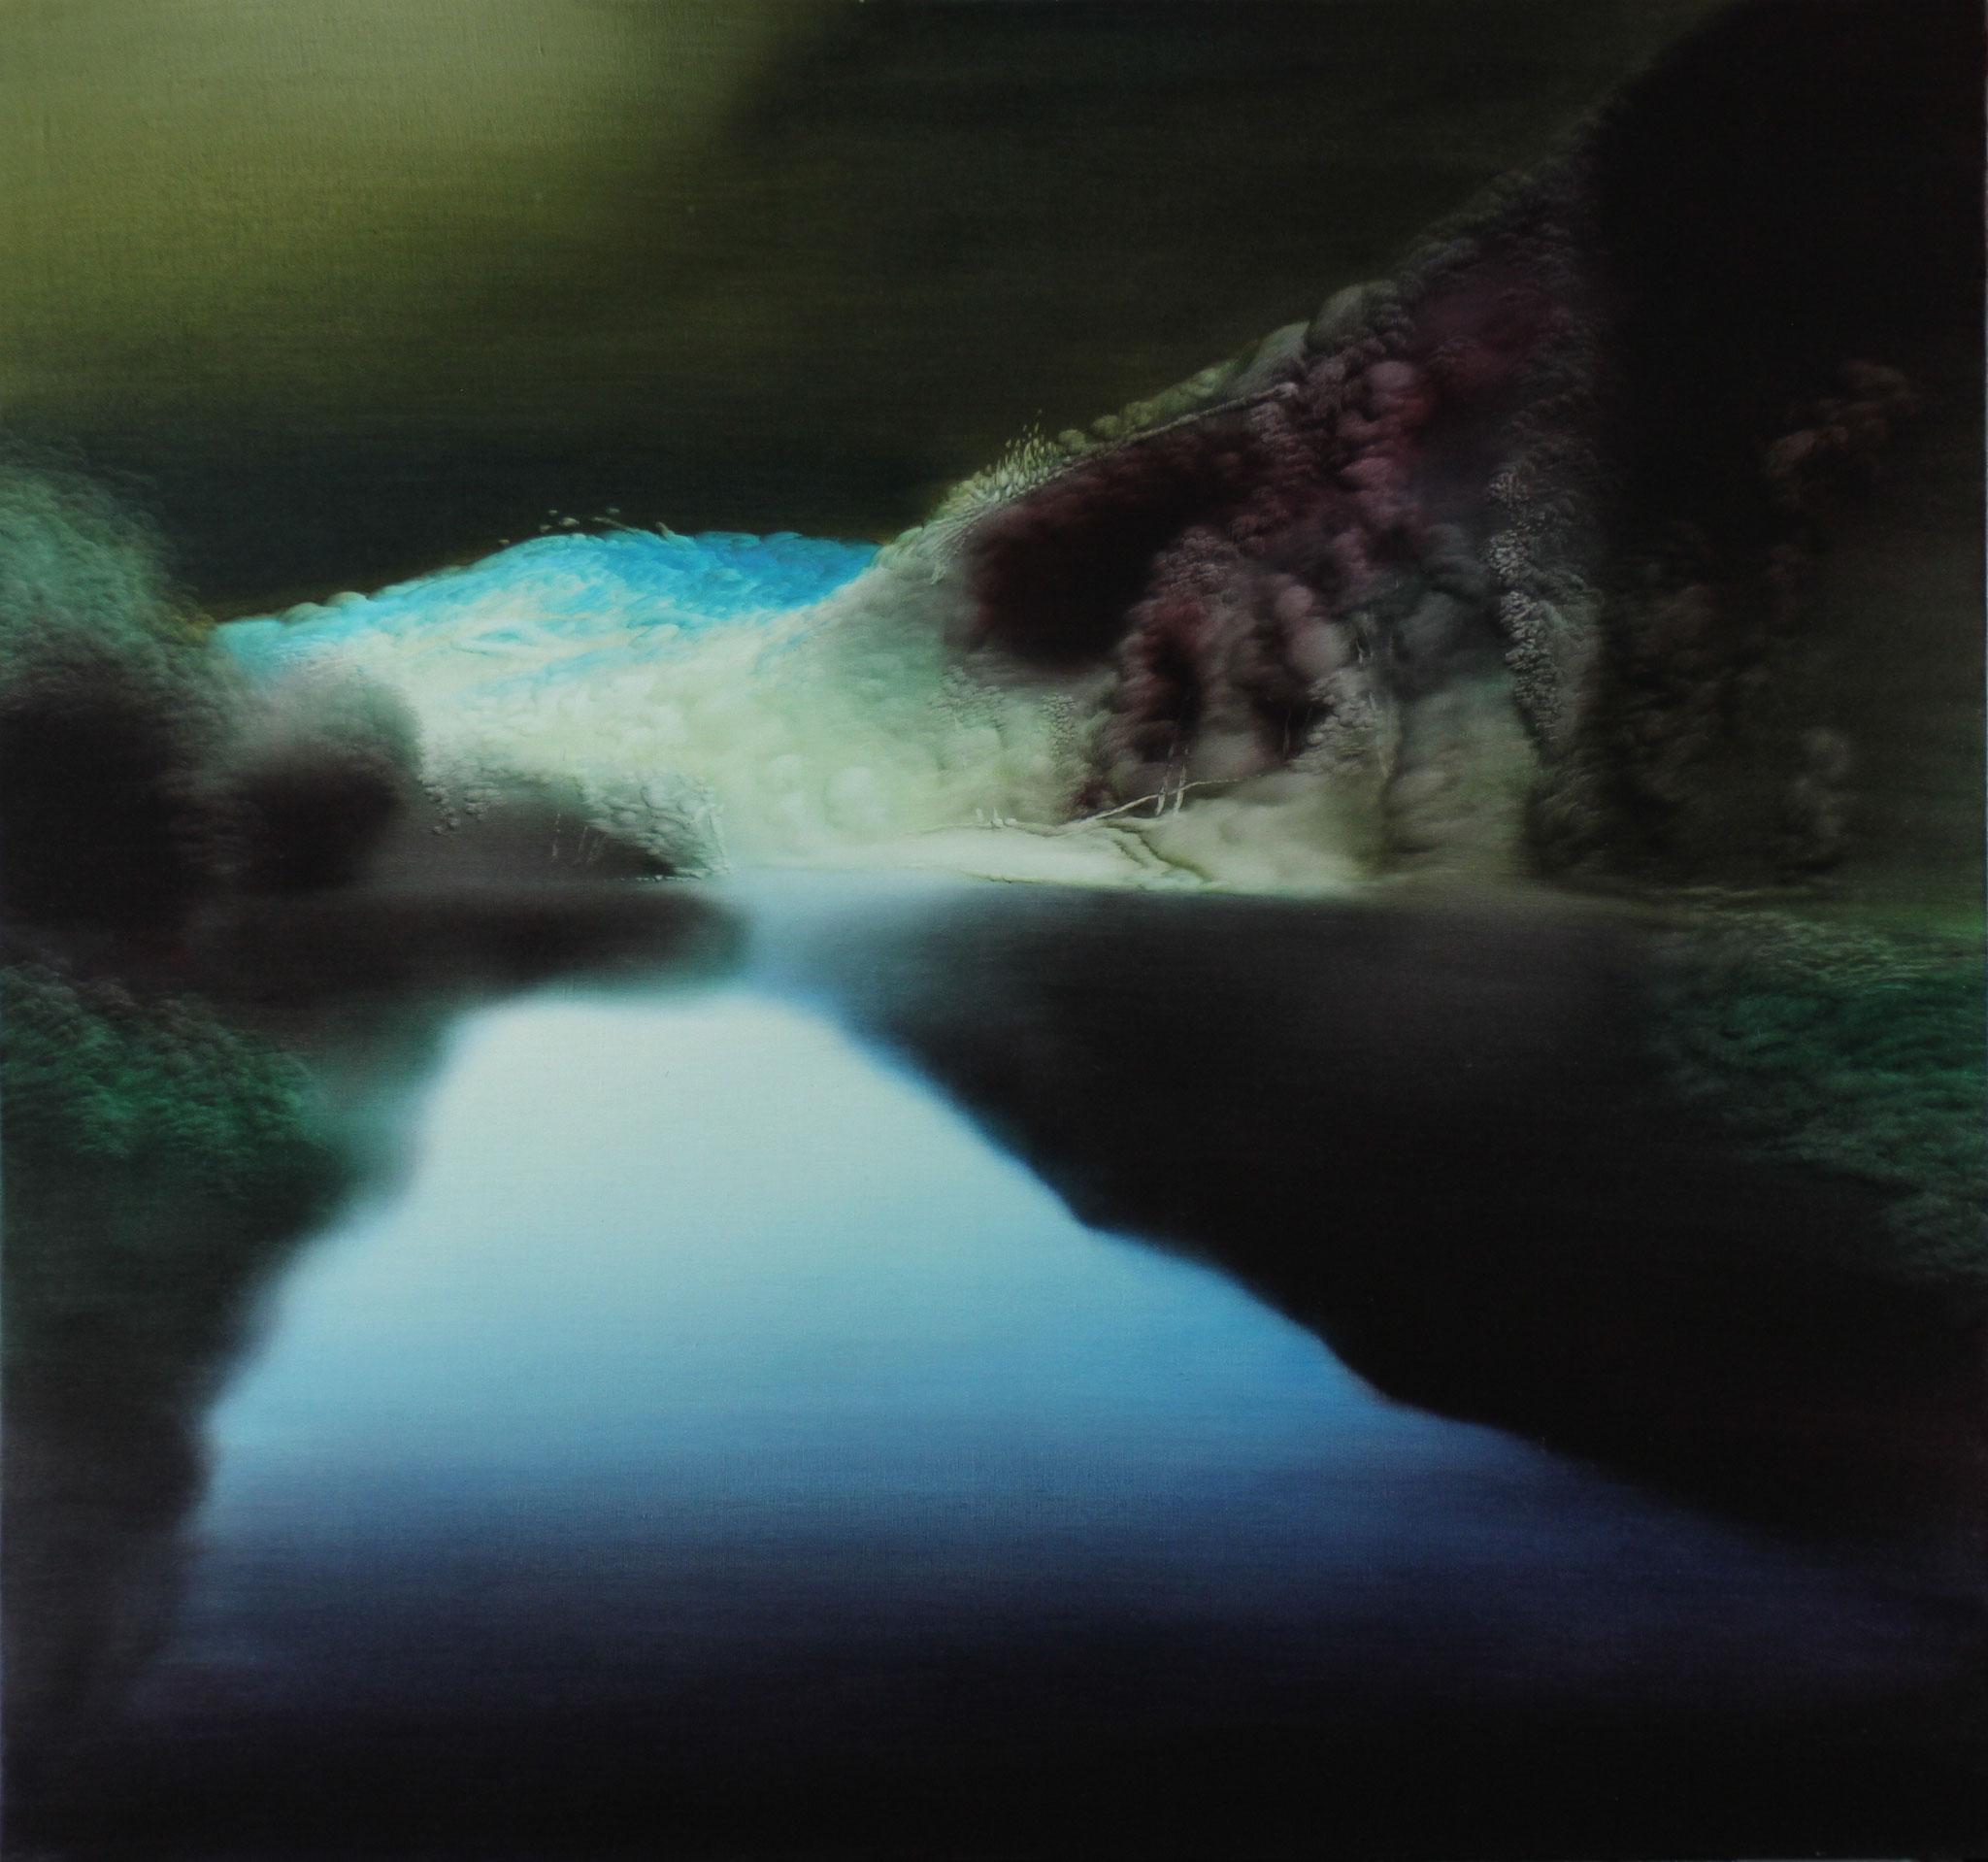 Türkisblau, 2006, Öl auf Leinwand, 140cm x 150cm